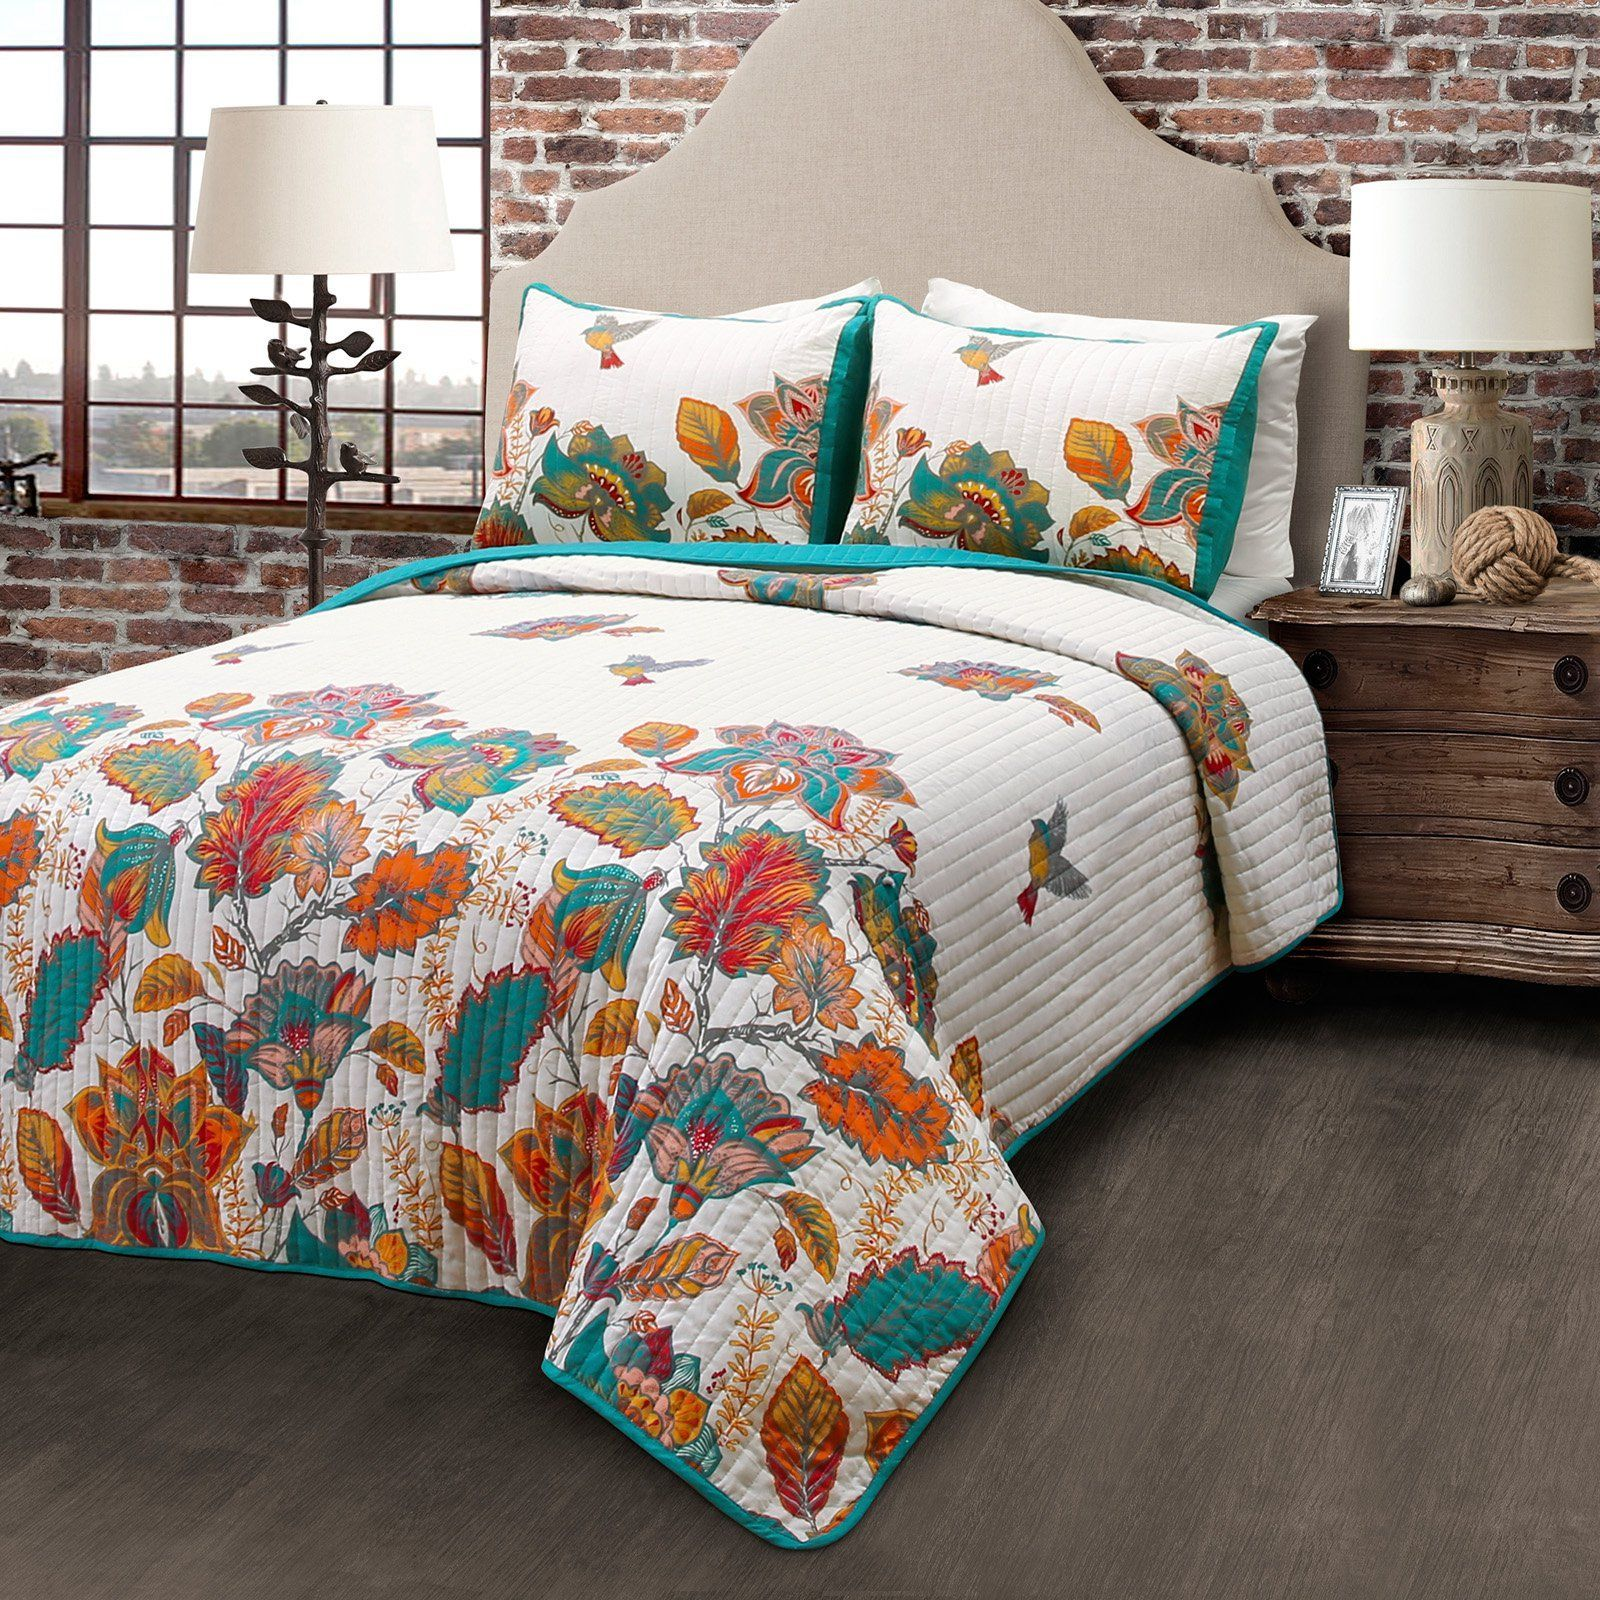 bird and flower 3 piece quilt set by lush decor 16t001215 europe rh pinterest com